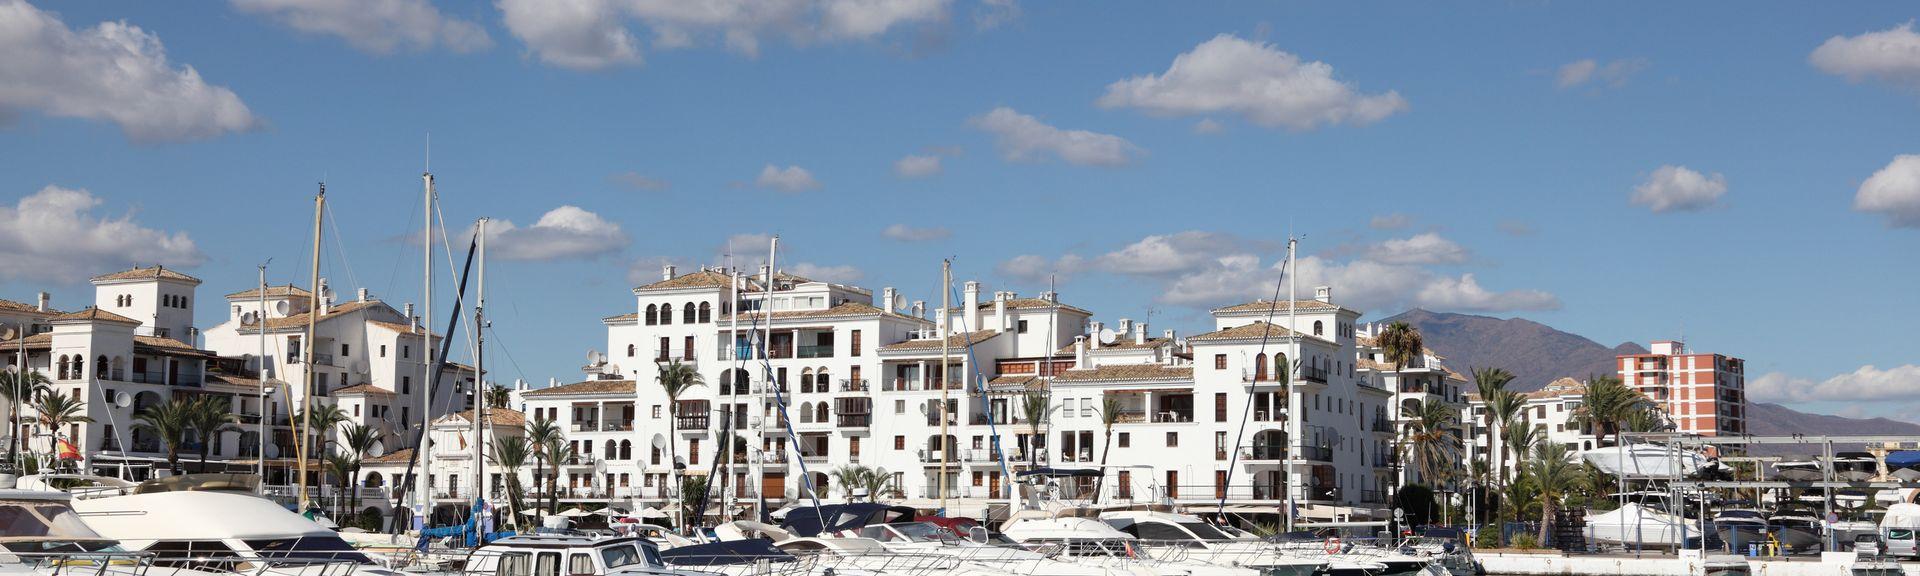 Puerto de la Duquesa, Manilva, Andalusië, Spanje